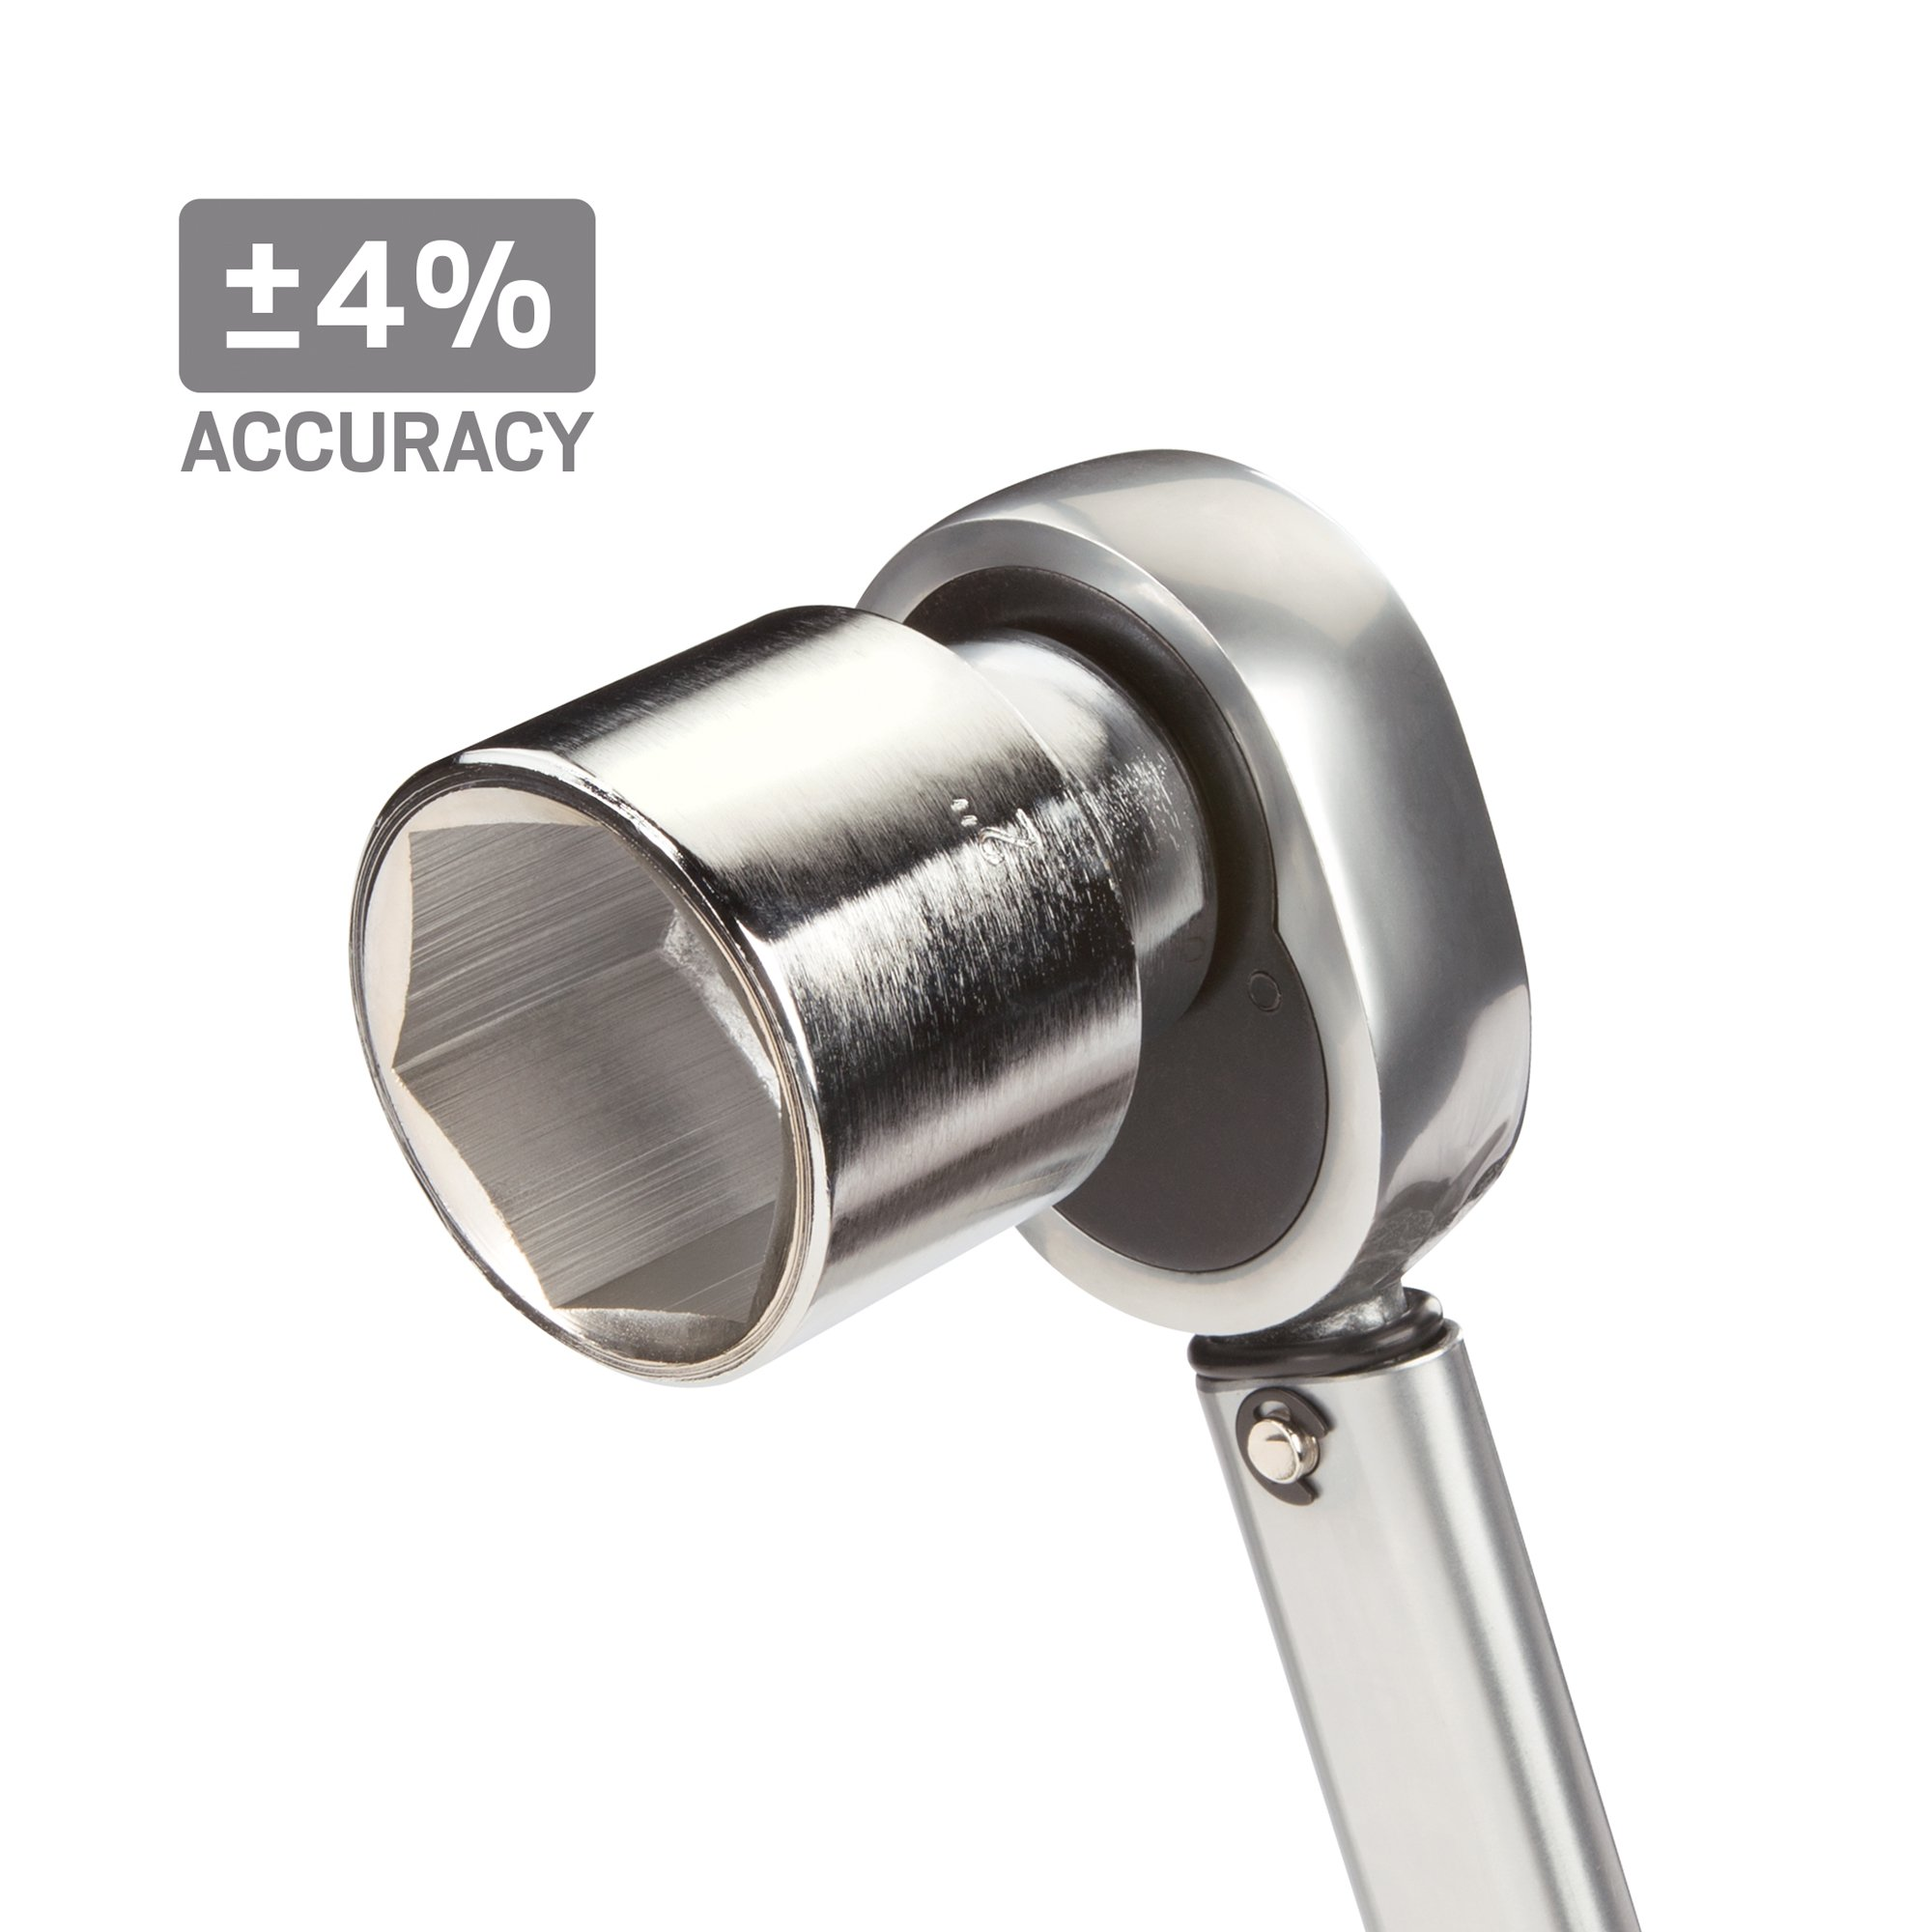 TEKTON 24350 3/4-Inch Drive Click Torque Wrench (50-300 ft.-lb./67.8-406.7 Nm) by TEKTON (Image #7)